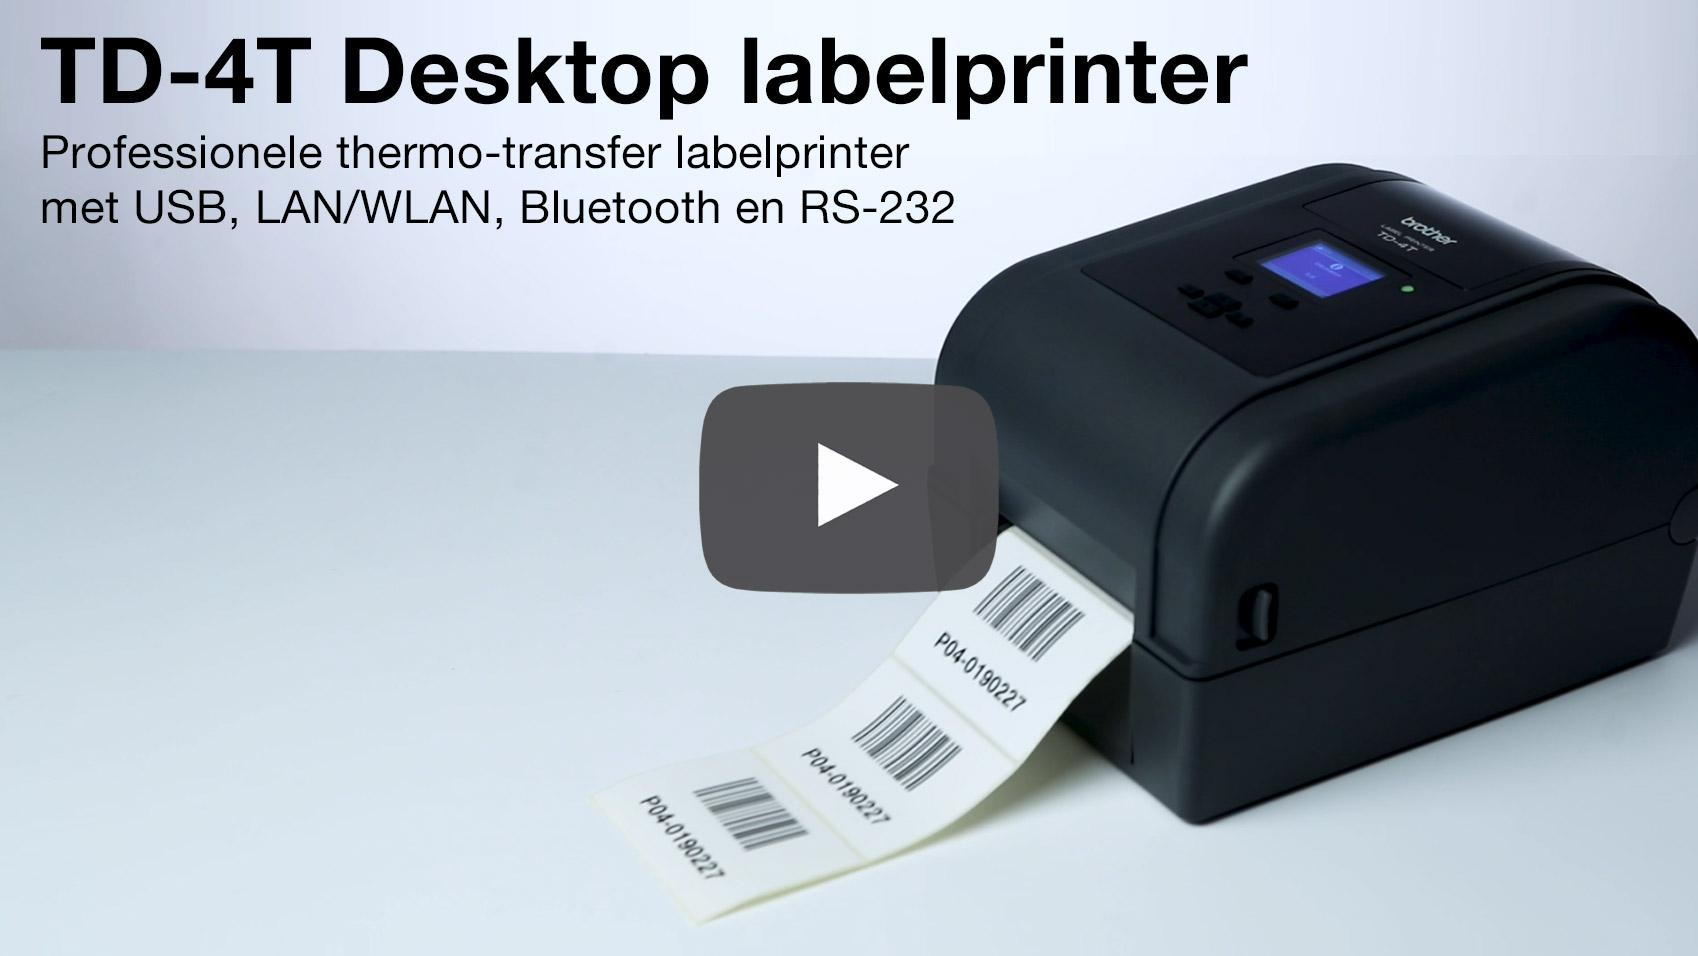 TD-4750TNWB Professionele thermo-transfer labelprinter met bekabelde/draadloze netwerkverbinding en Bluetooth 6